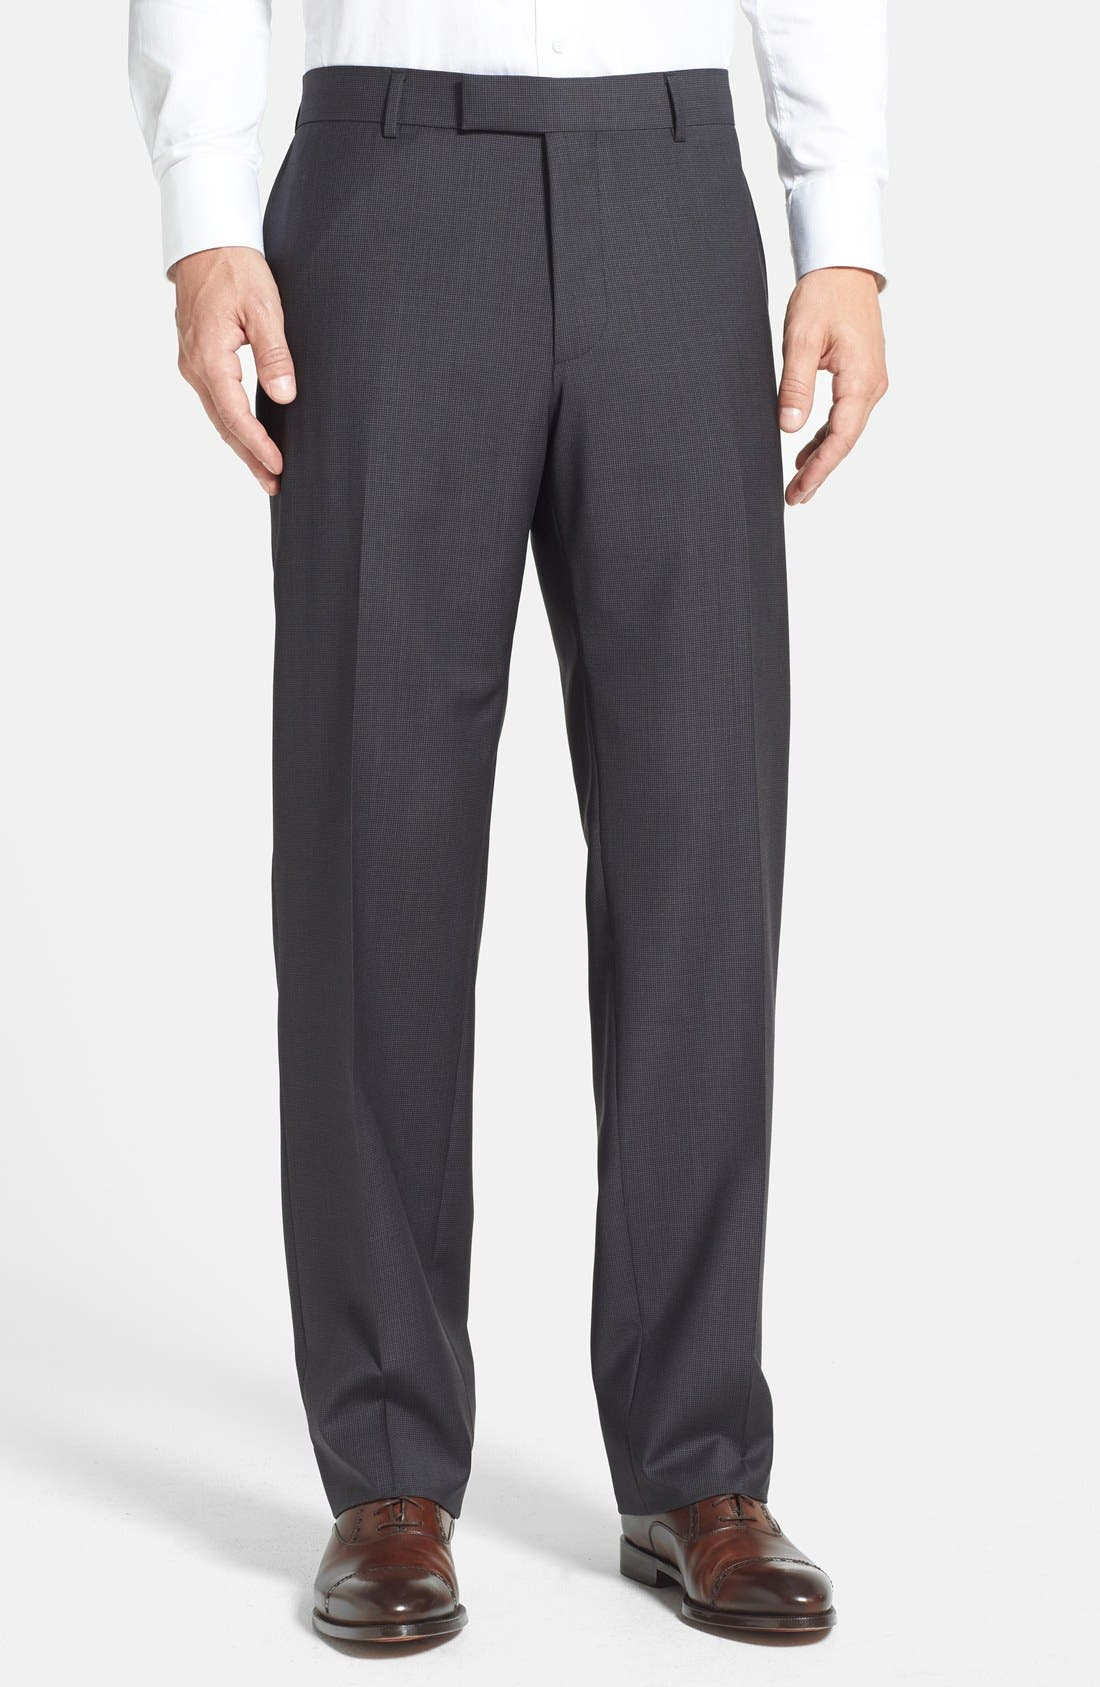 Main Image - BOSS HUGO BOSS 'Jeffrey' Flat Front Trousers